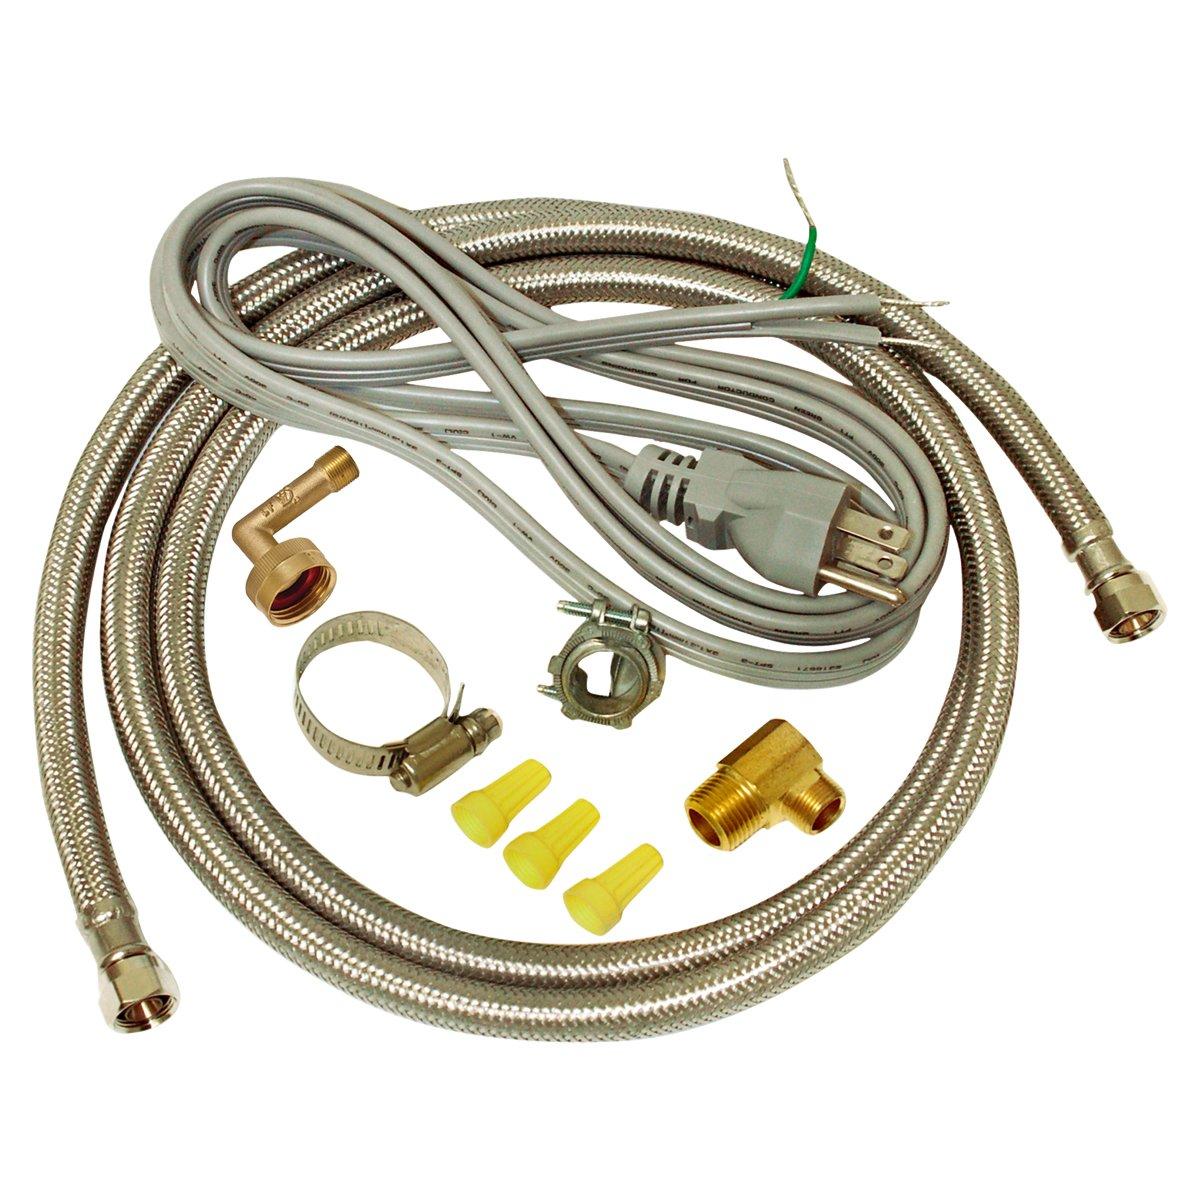 EZ-FLO 48337 Dishwasher Installation Kit